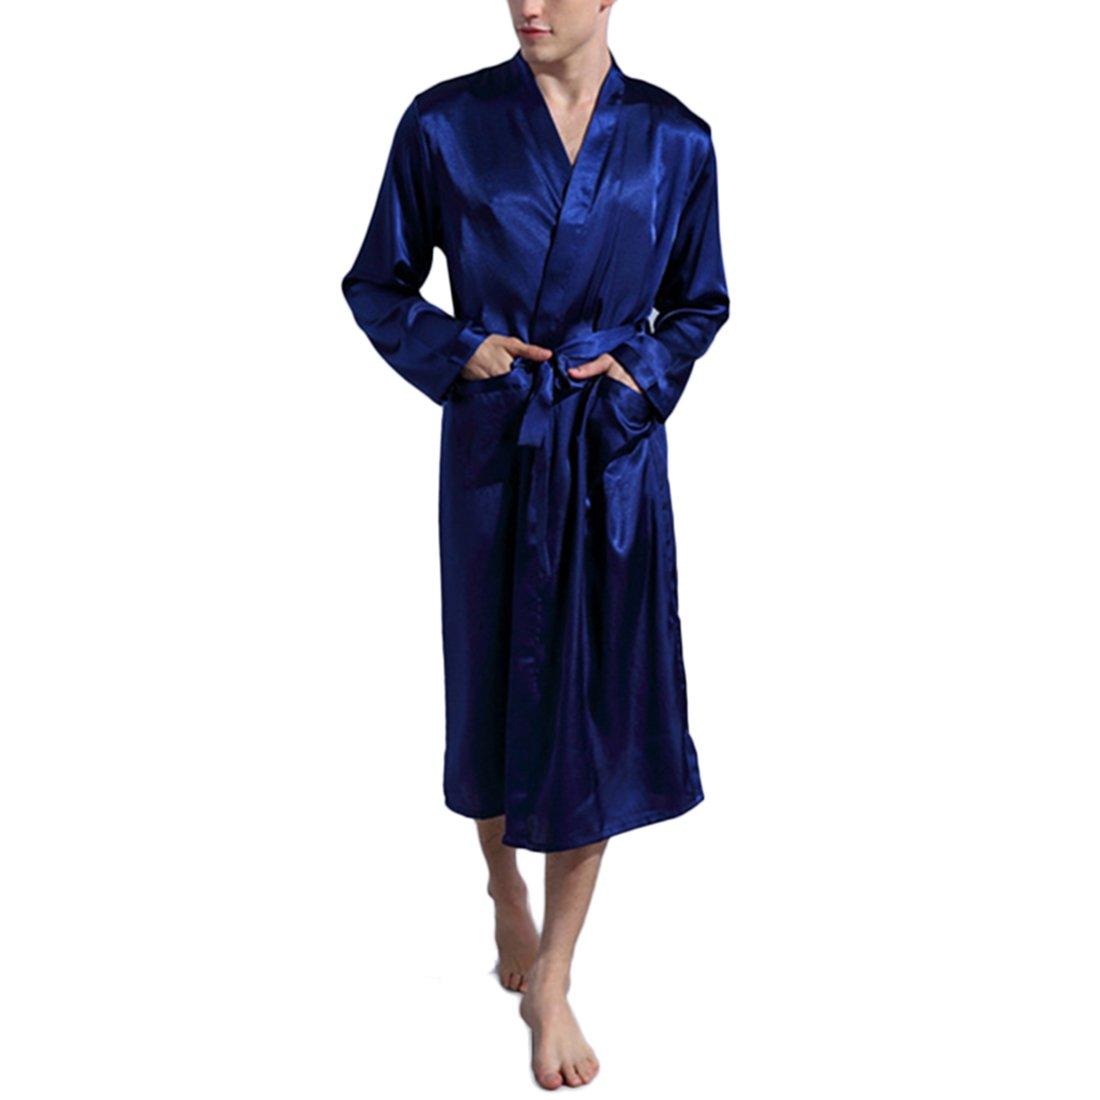 Kimono Robe for Men, Men V Neck Satin Robe Kimono Long Bathrobe Lightweight Sleepwear Wedding (Dark Blue,Medium/US M)